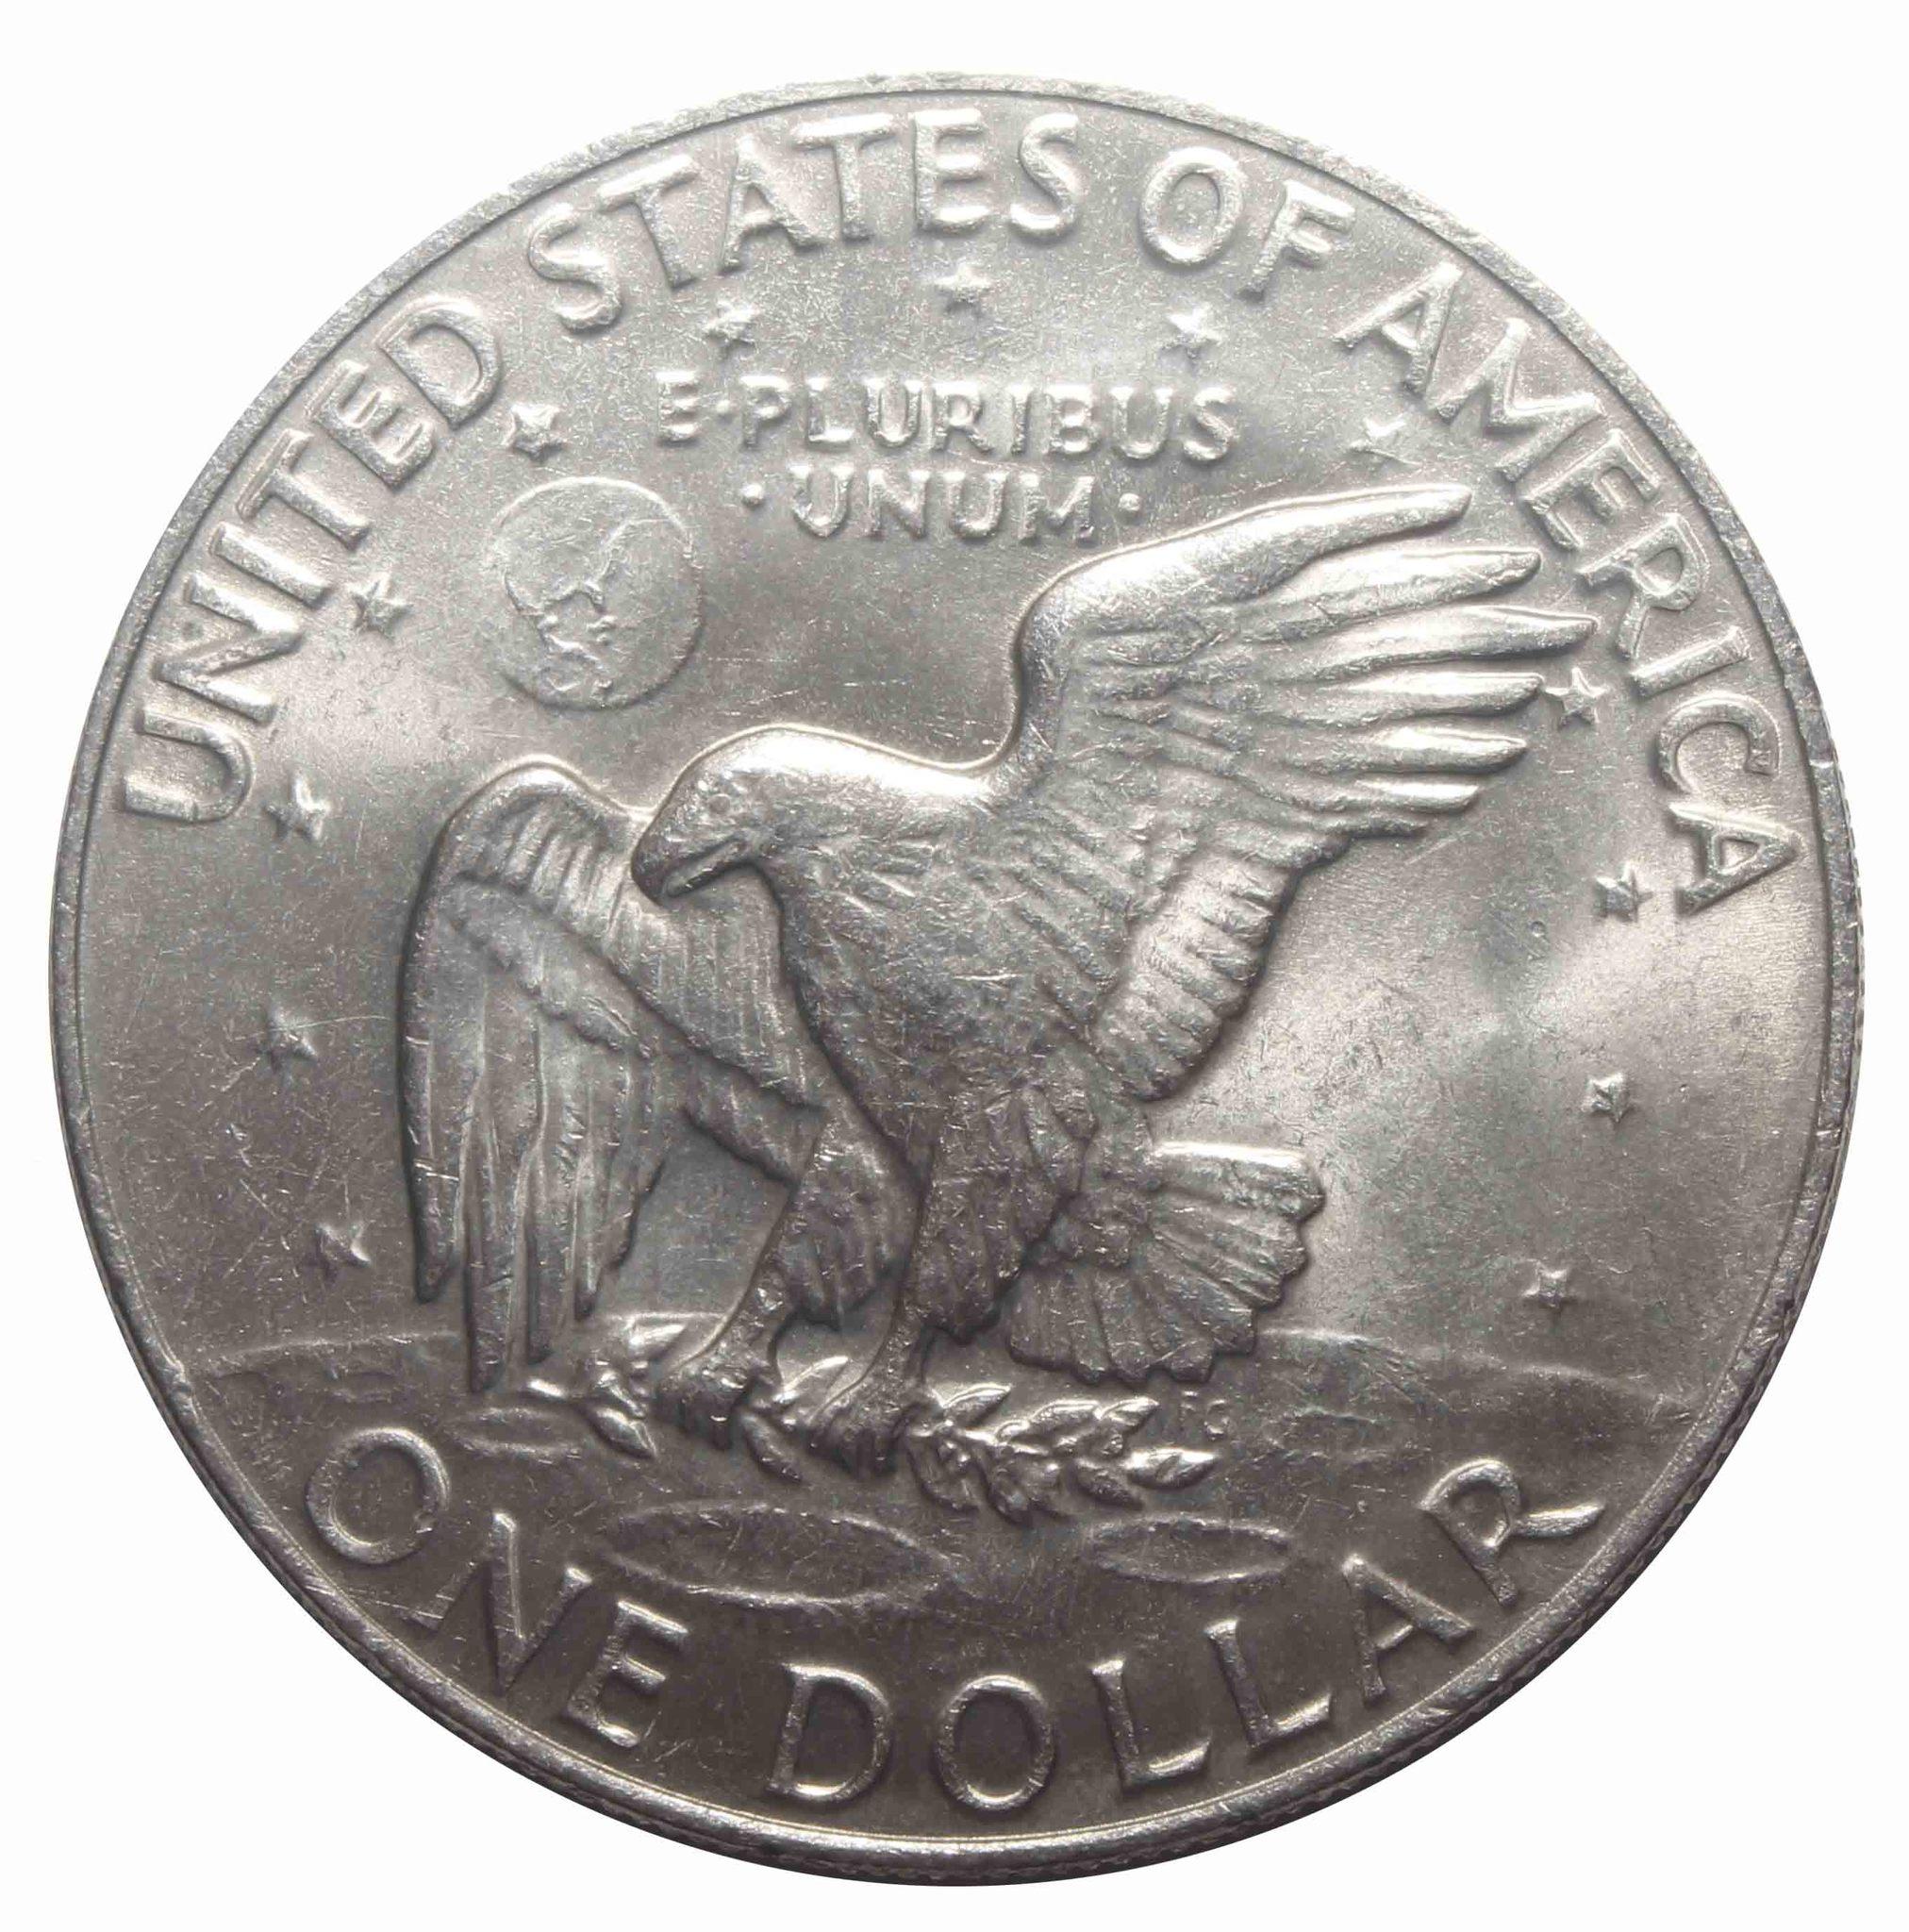 1 доллар 1978 США Эйзенхауэр XF (Лунный)